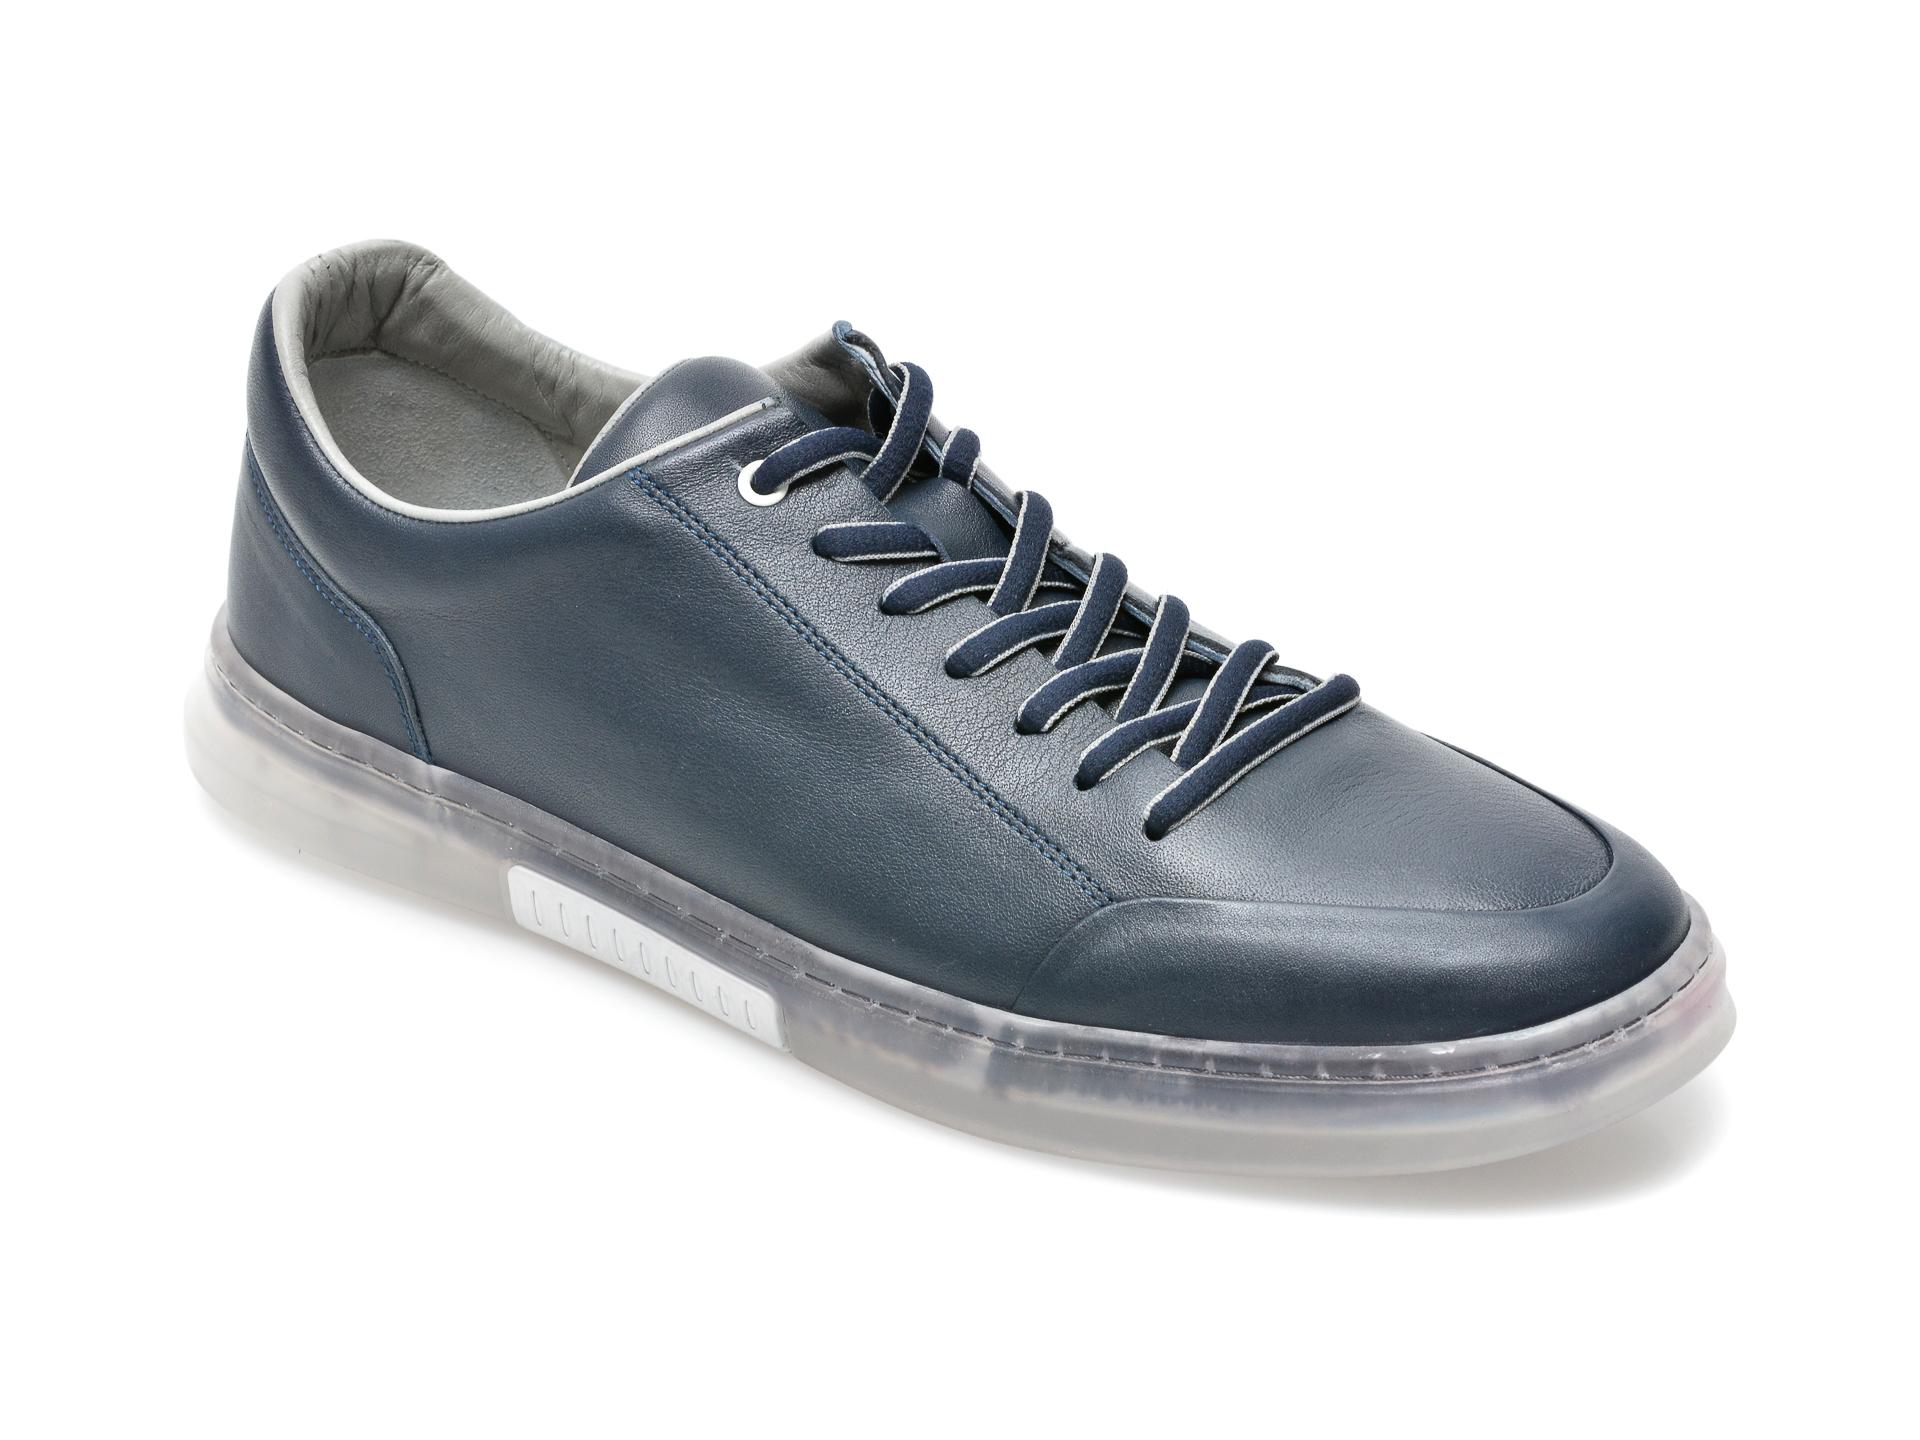 Pantofi OTTER bleumarin, 22601, din piele naturala imagine otter.ro 2021